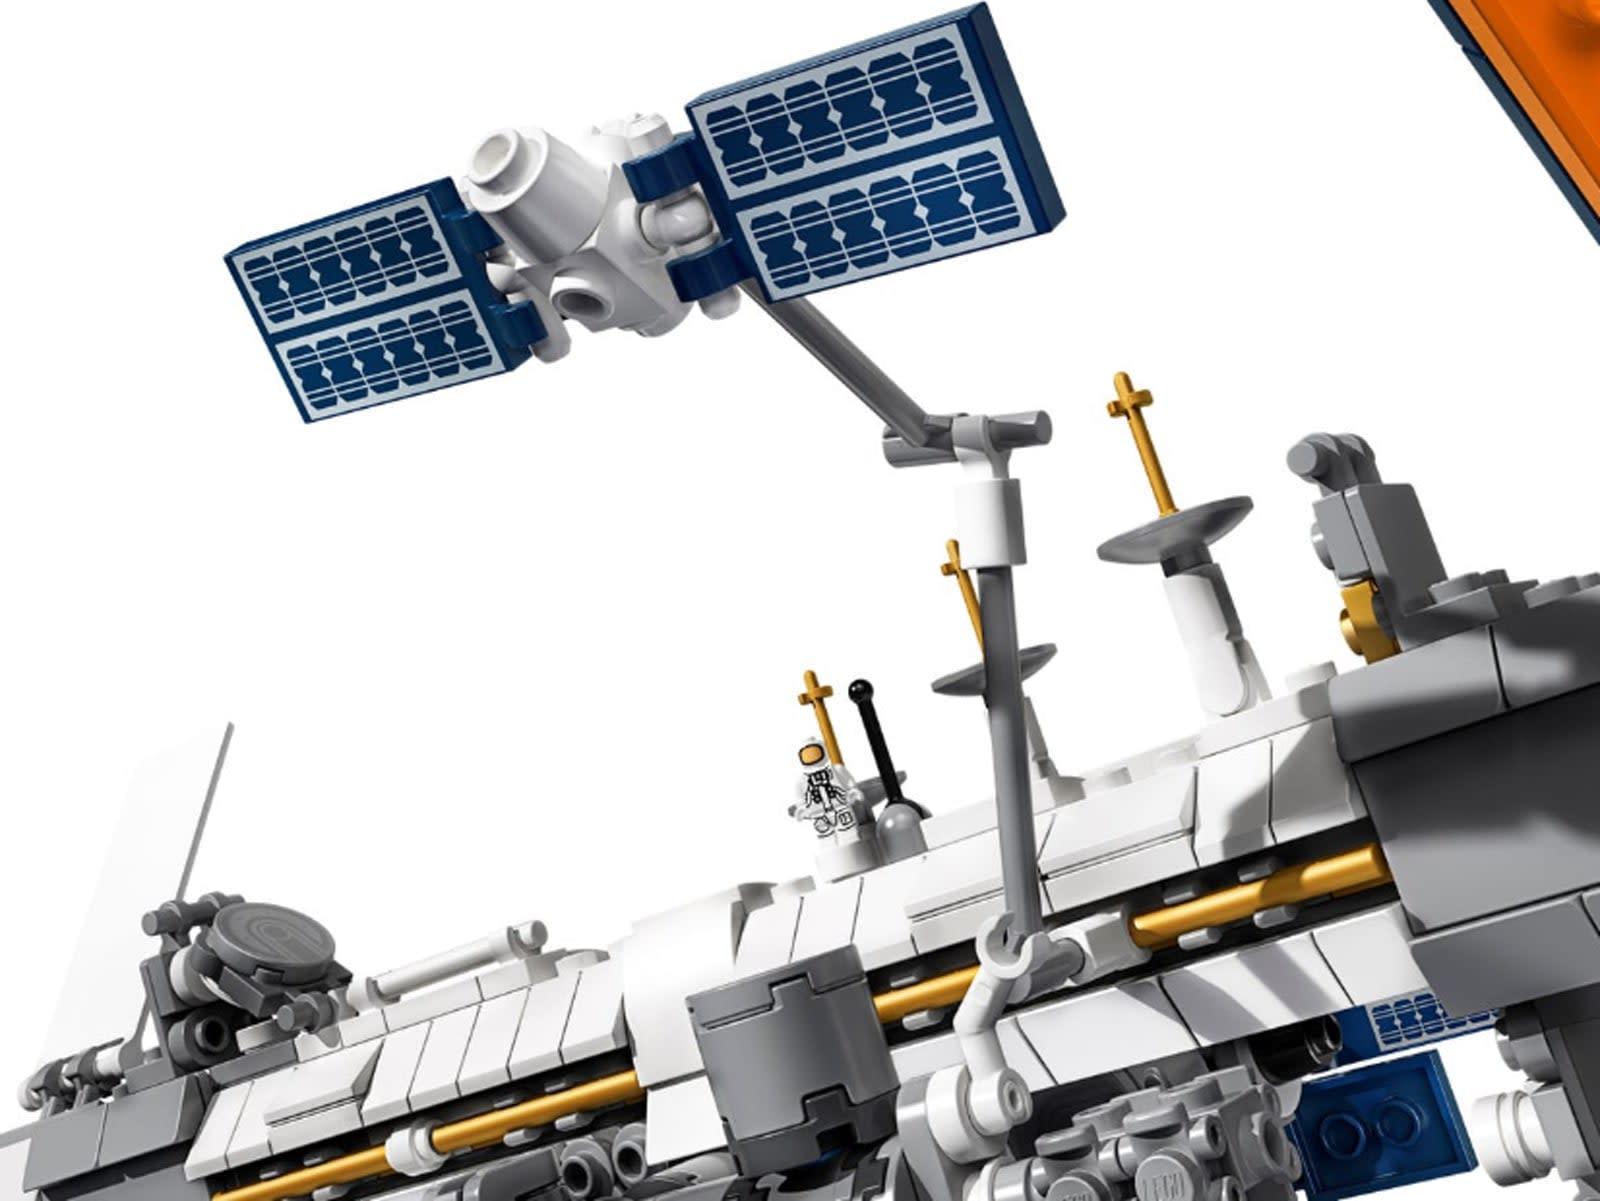 Lego ISS inline